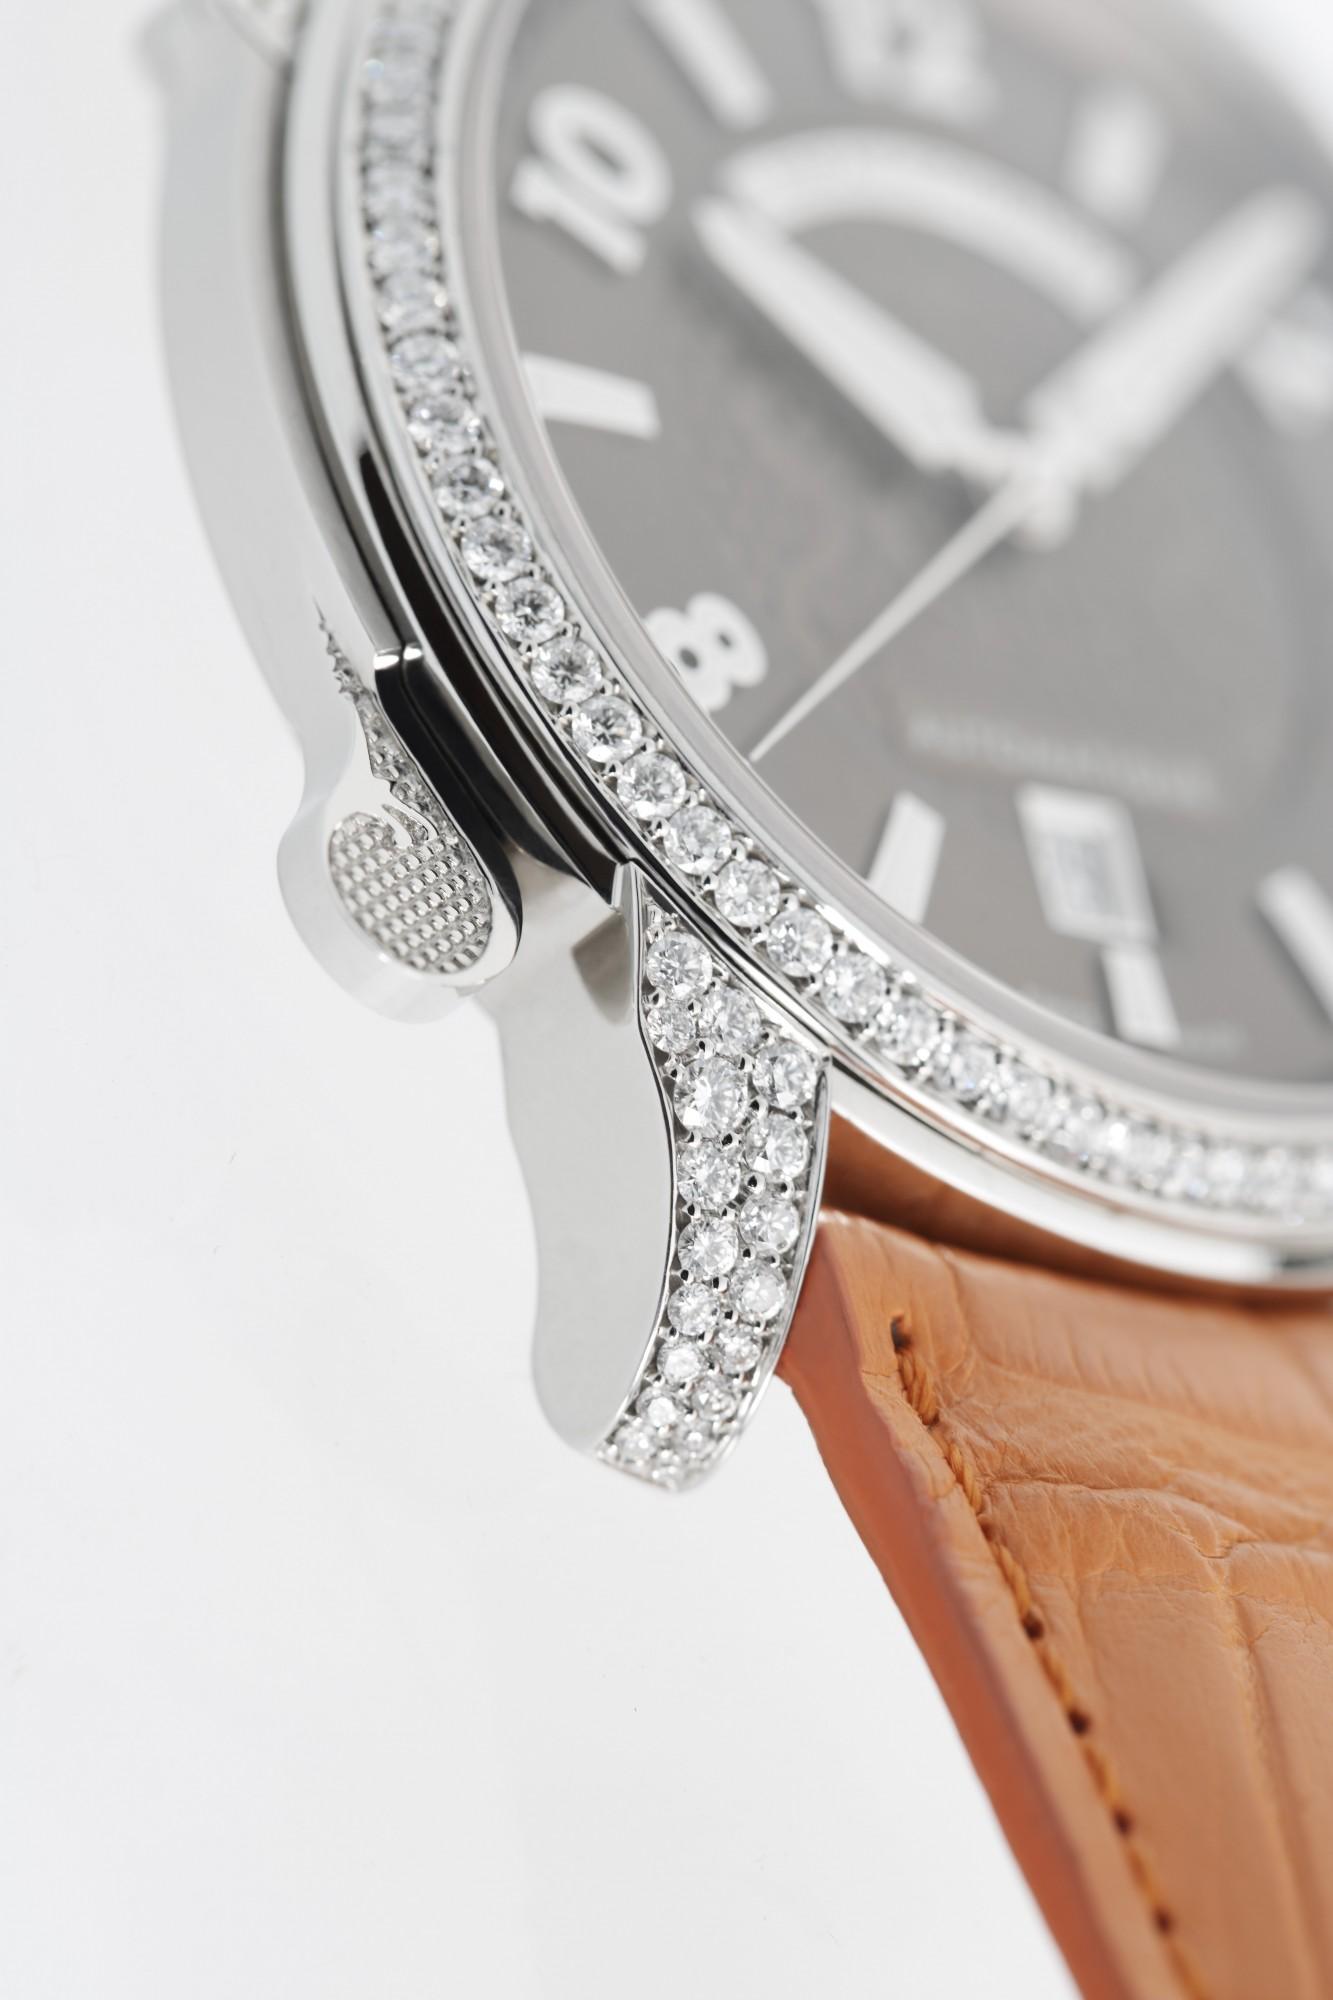 11-12-lebeau -diamonds03087 copy